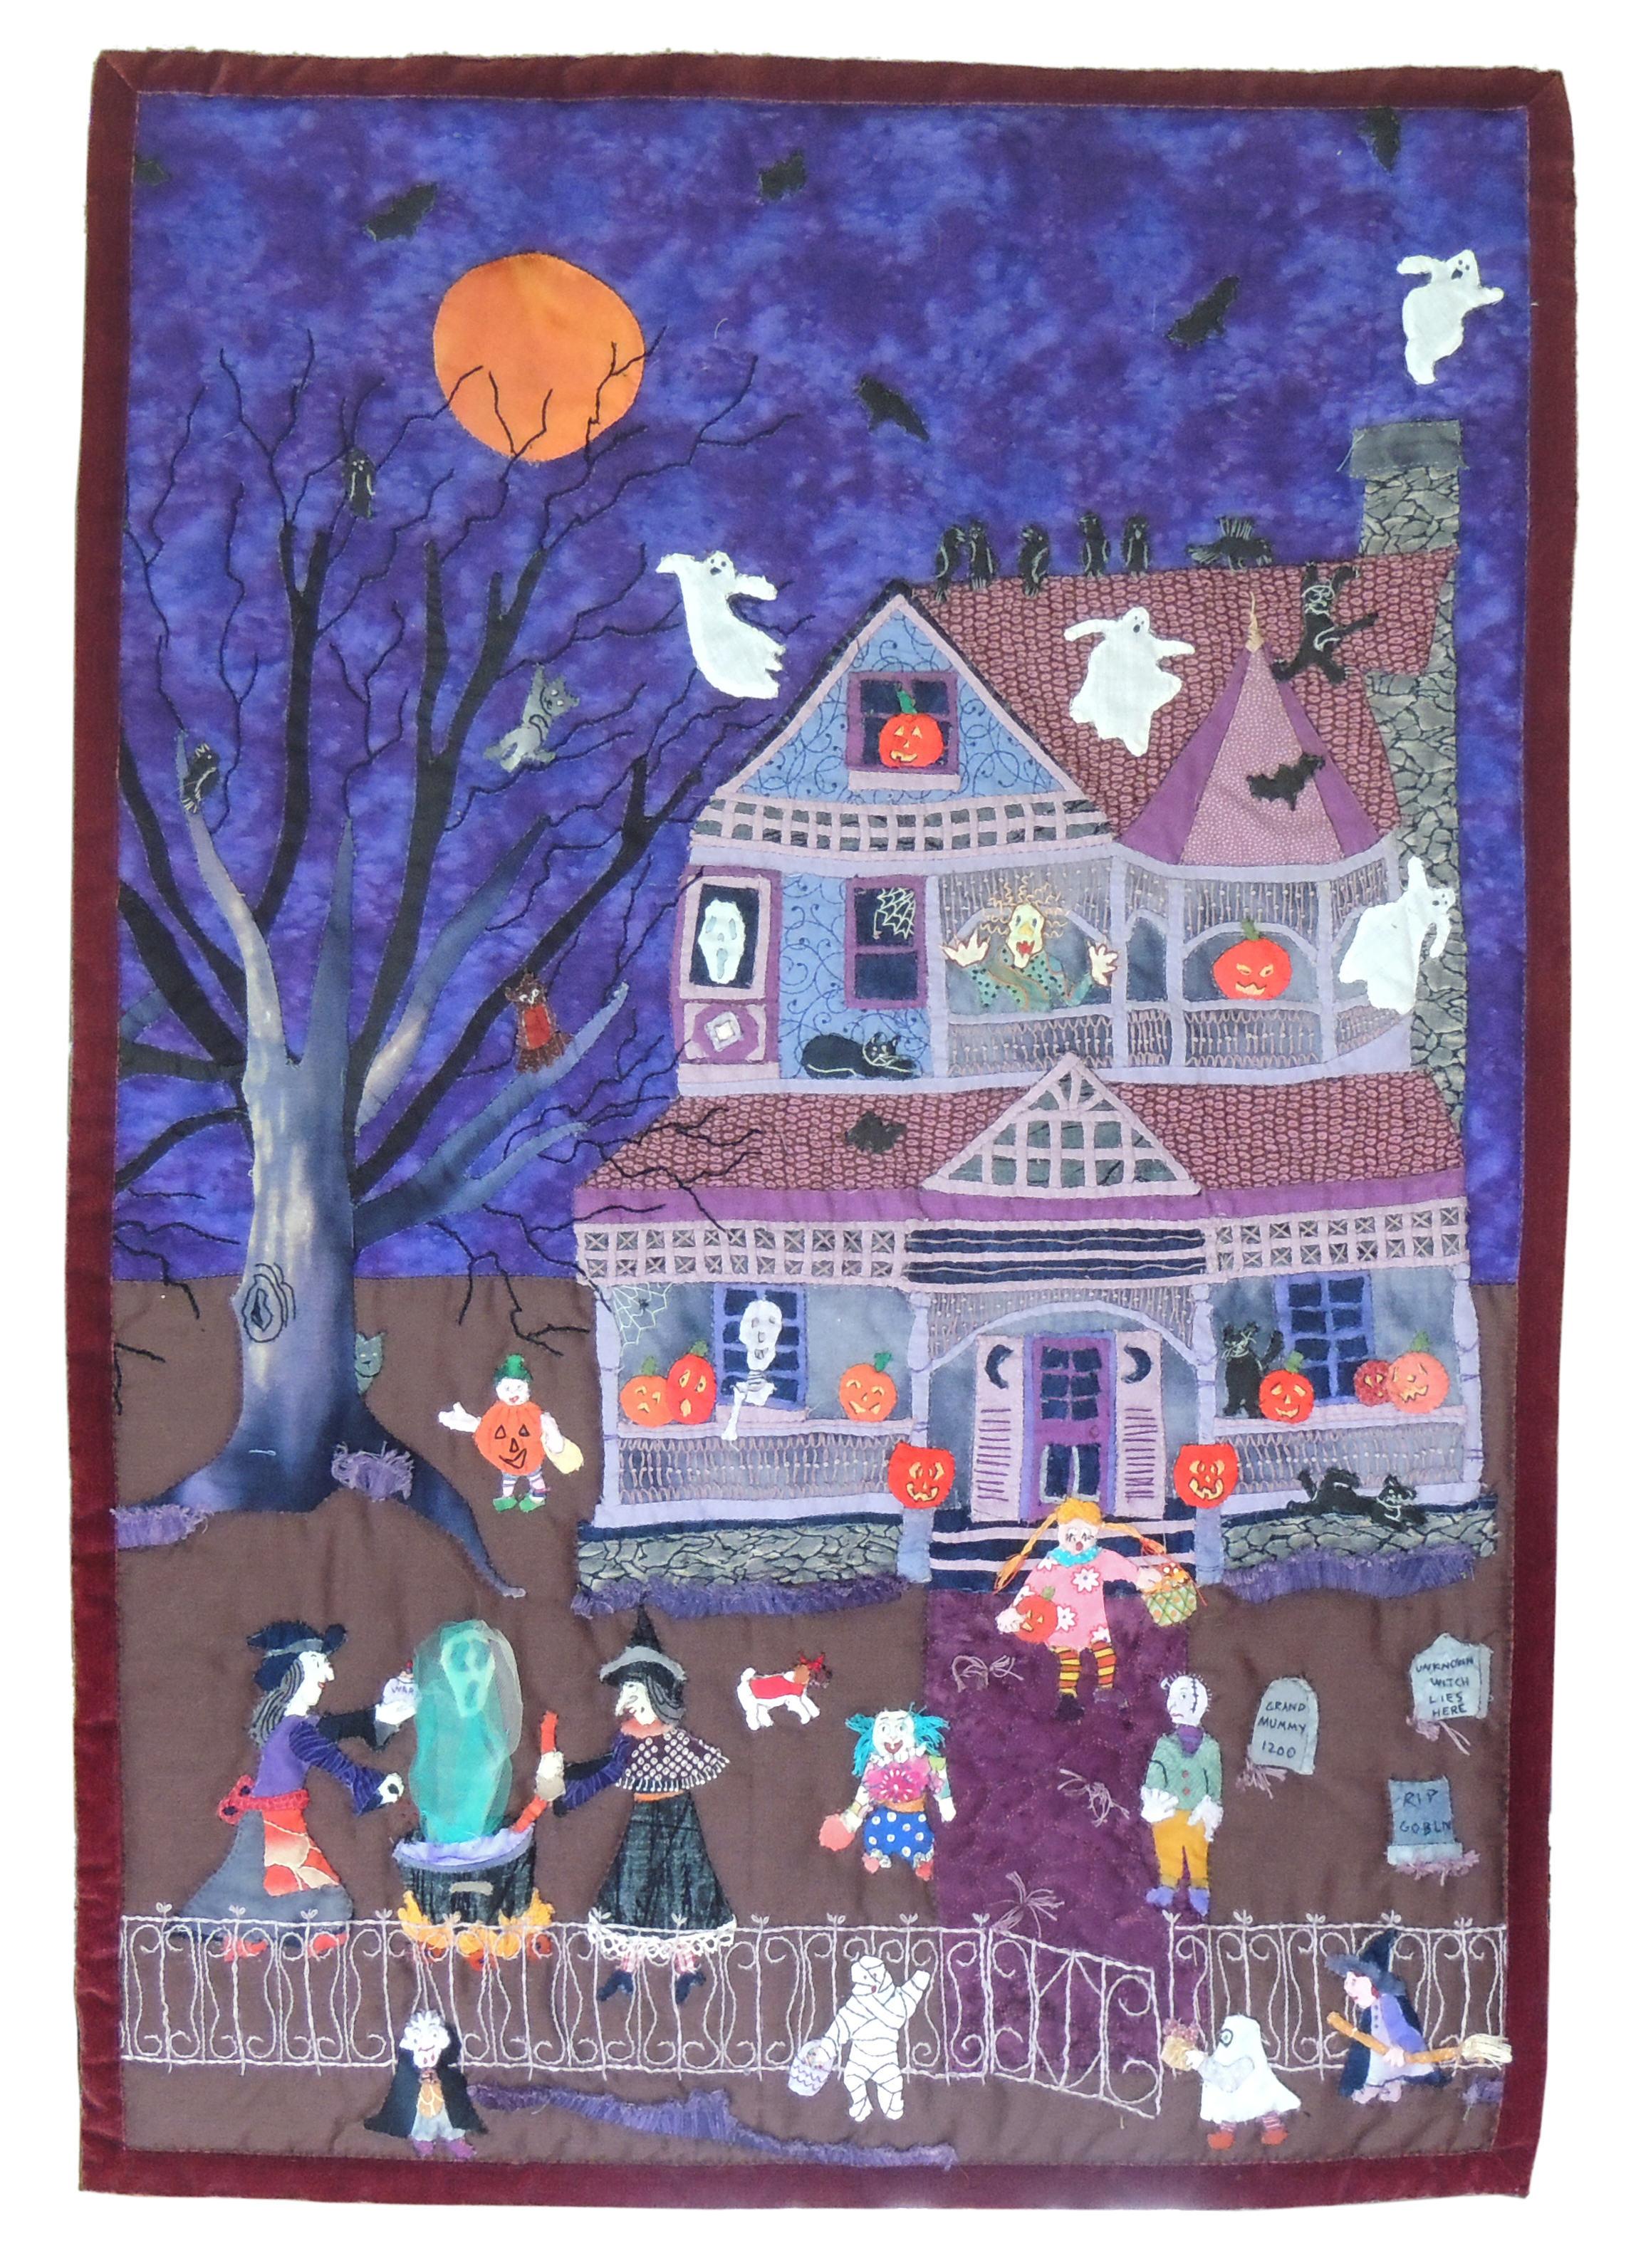 "Marianne Rabb Britton | TRICK OR TREAT| Fabric & Embroidery | 31 x 22"" | Estate of Marianne Rabb Britton"